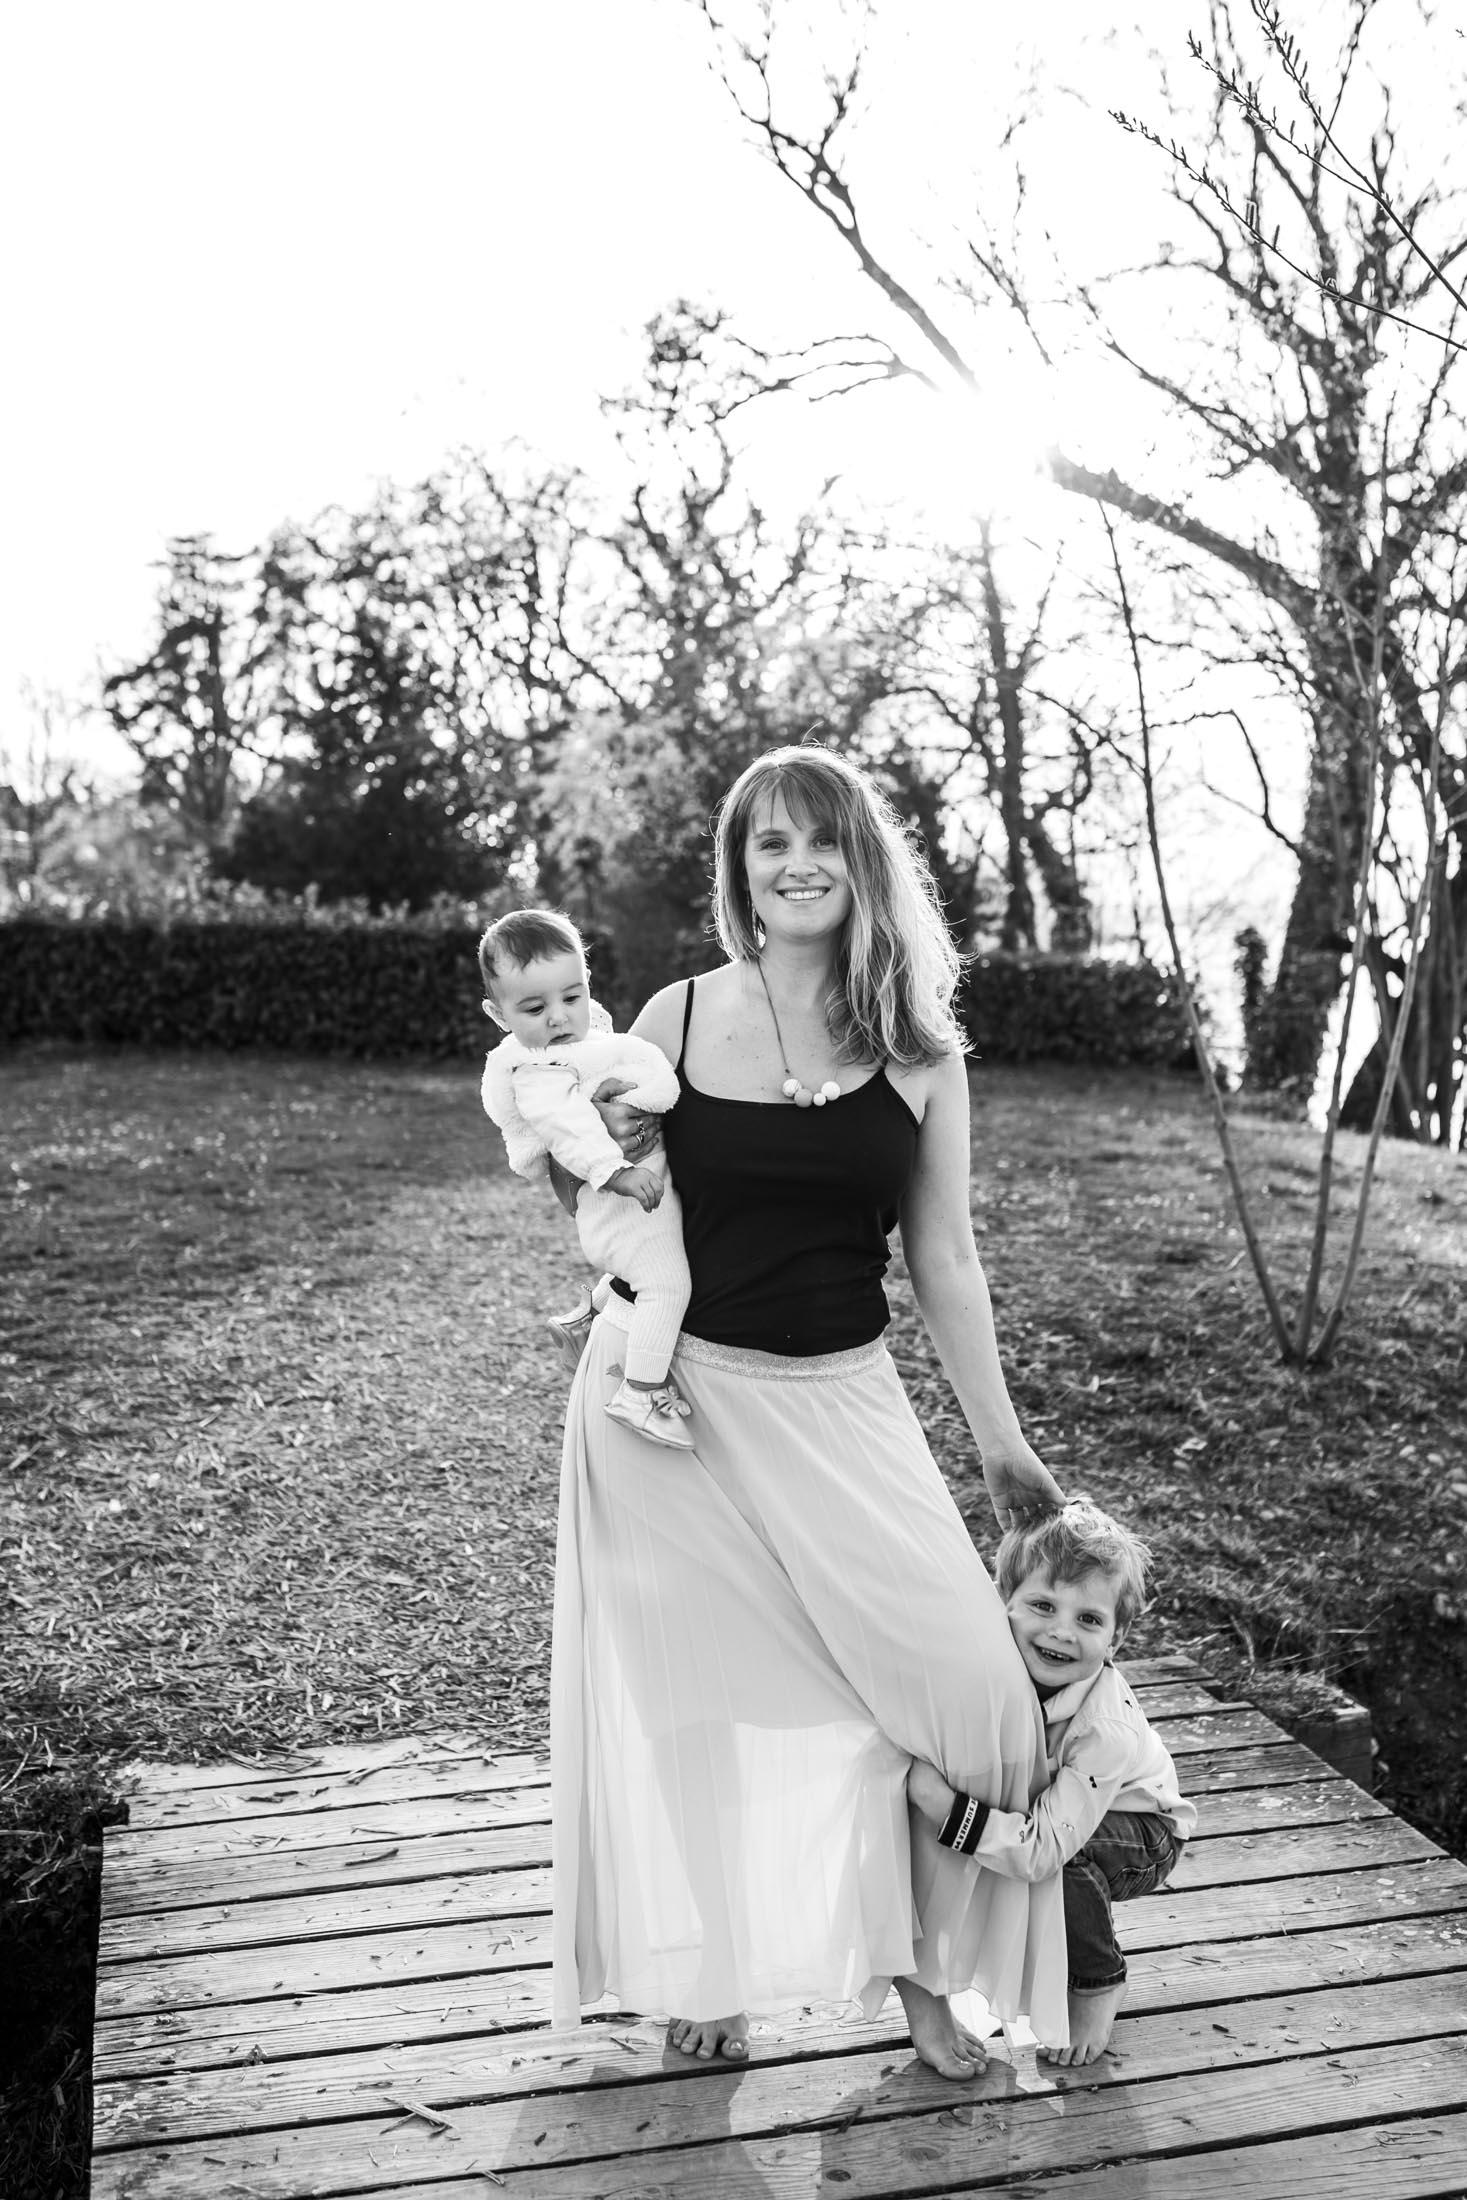 Vanessa Amiot photographe - photographe thonon - photographe famille thonon - photographe famille Haute Savoie -